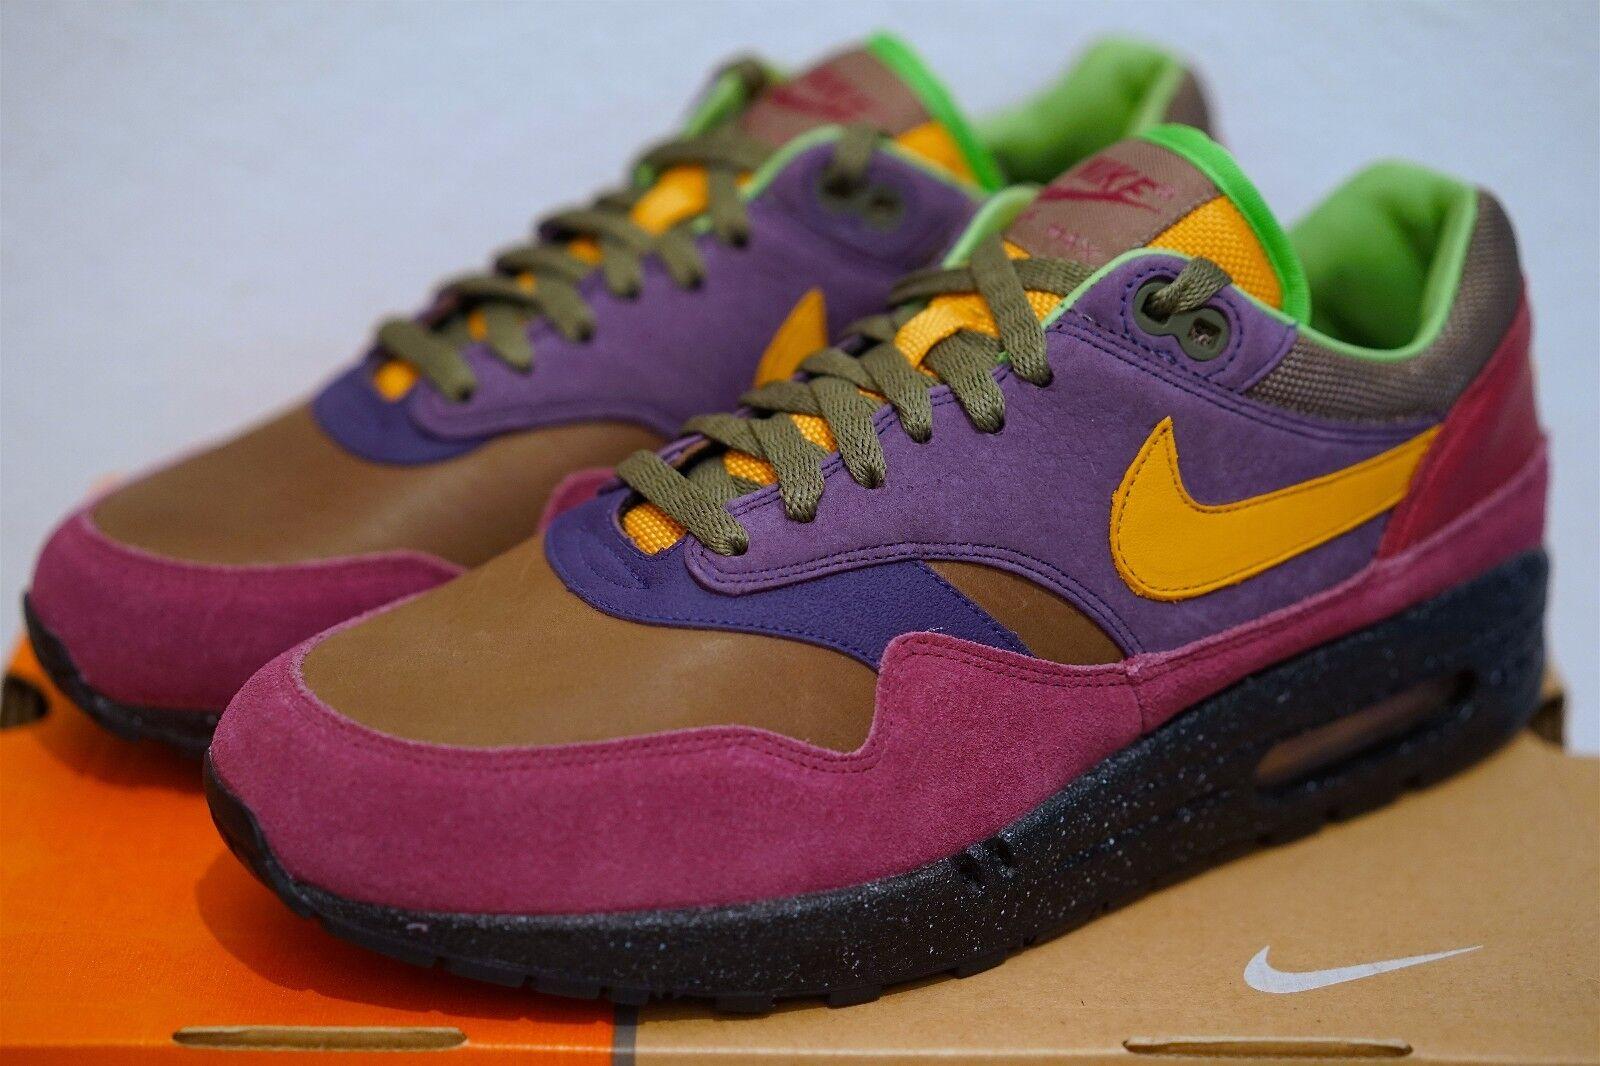 Nike Air Max 1 premium premium premium pack huarache 2006 us 9 Terra Atmos Elephant TZ 70613b